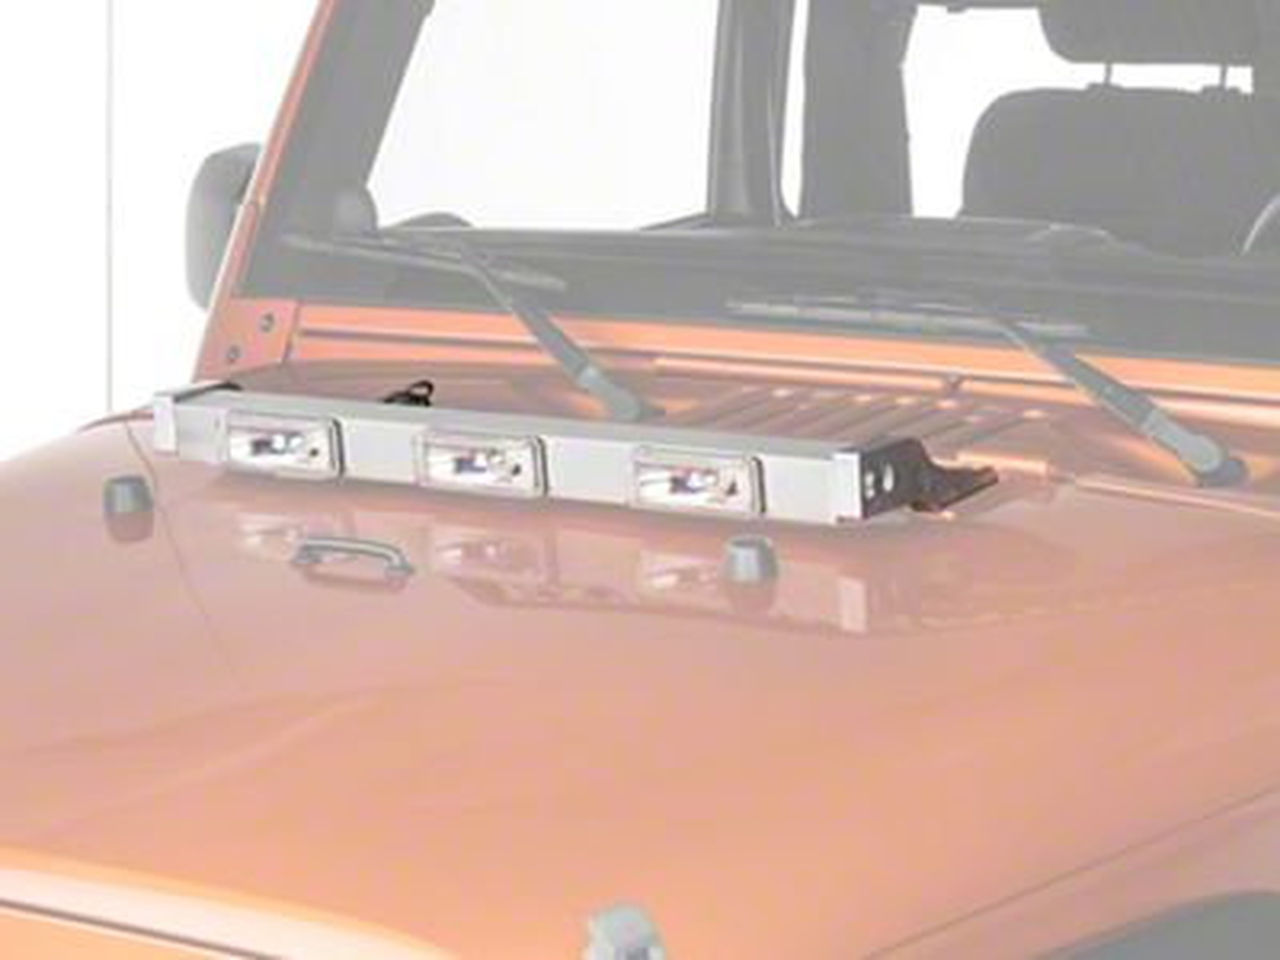 Delta Aluminum Xenon Hood Light Bar - Silver (97-11 Jeep Wrangler TJ & JK)